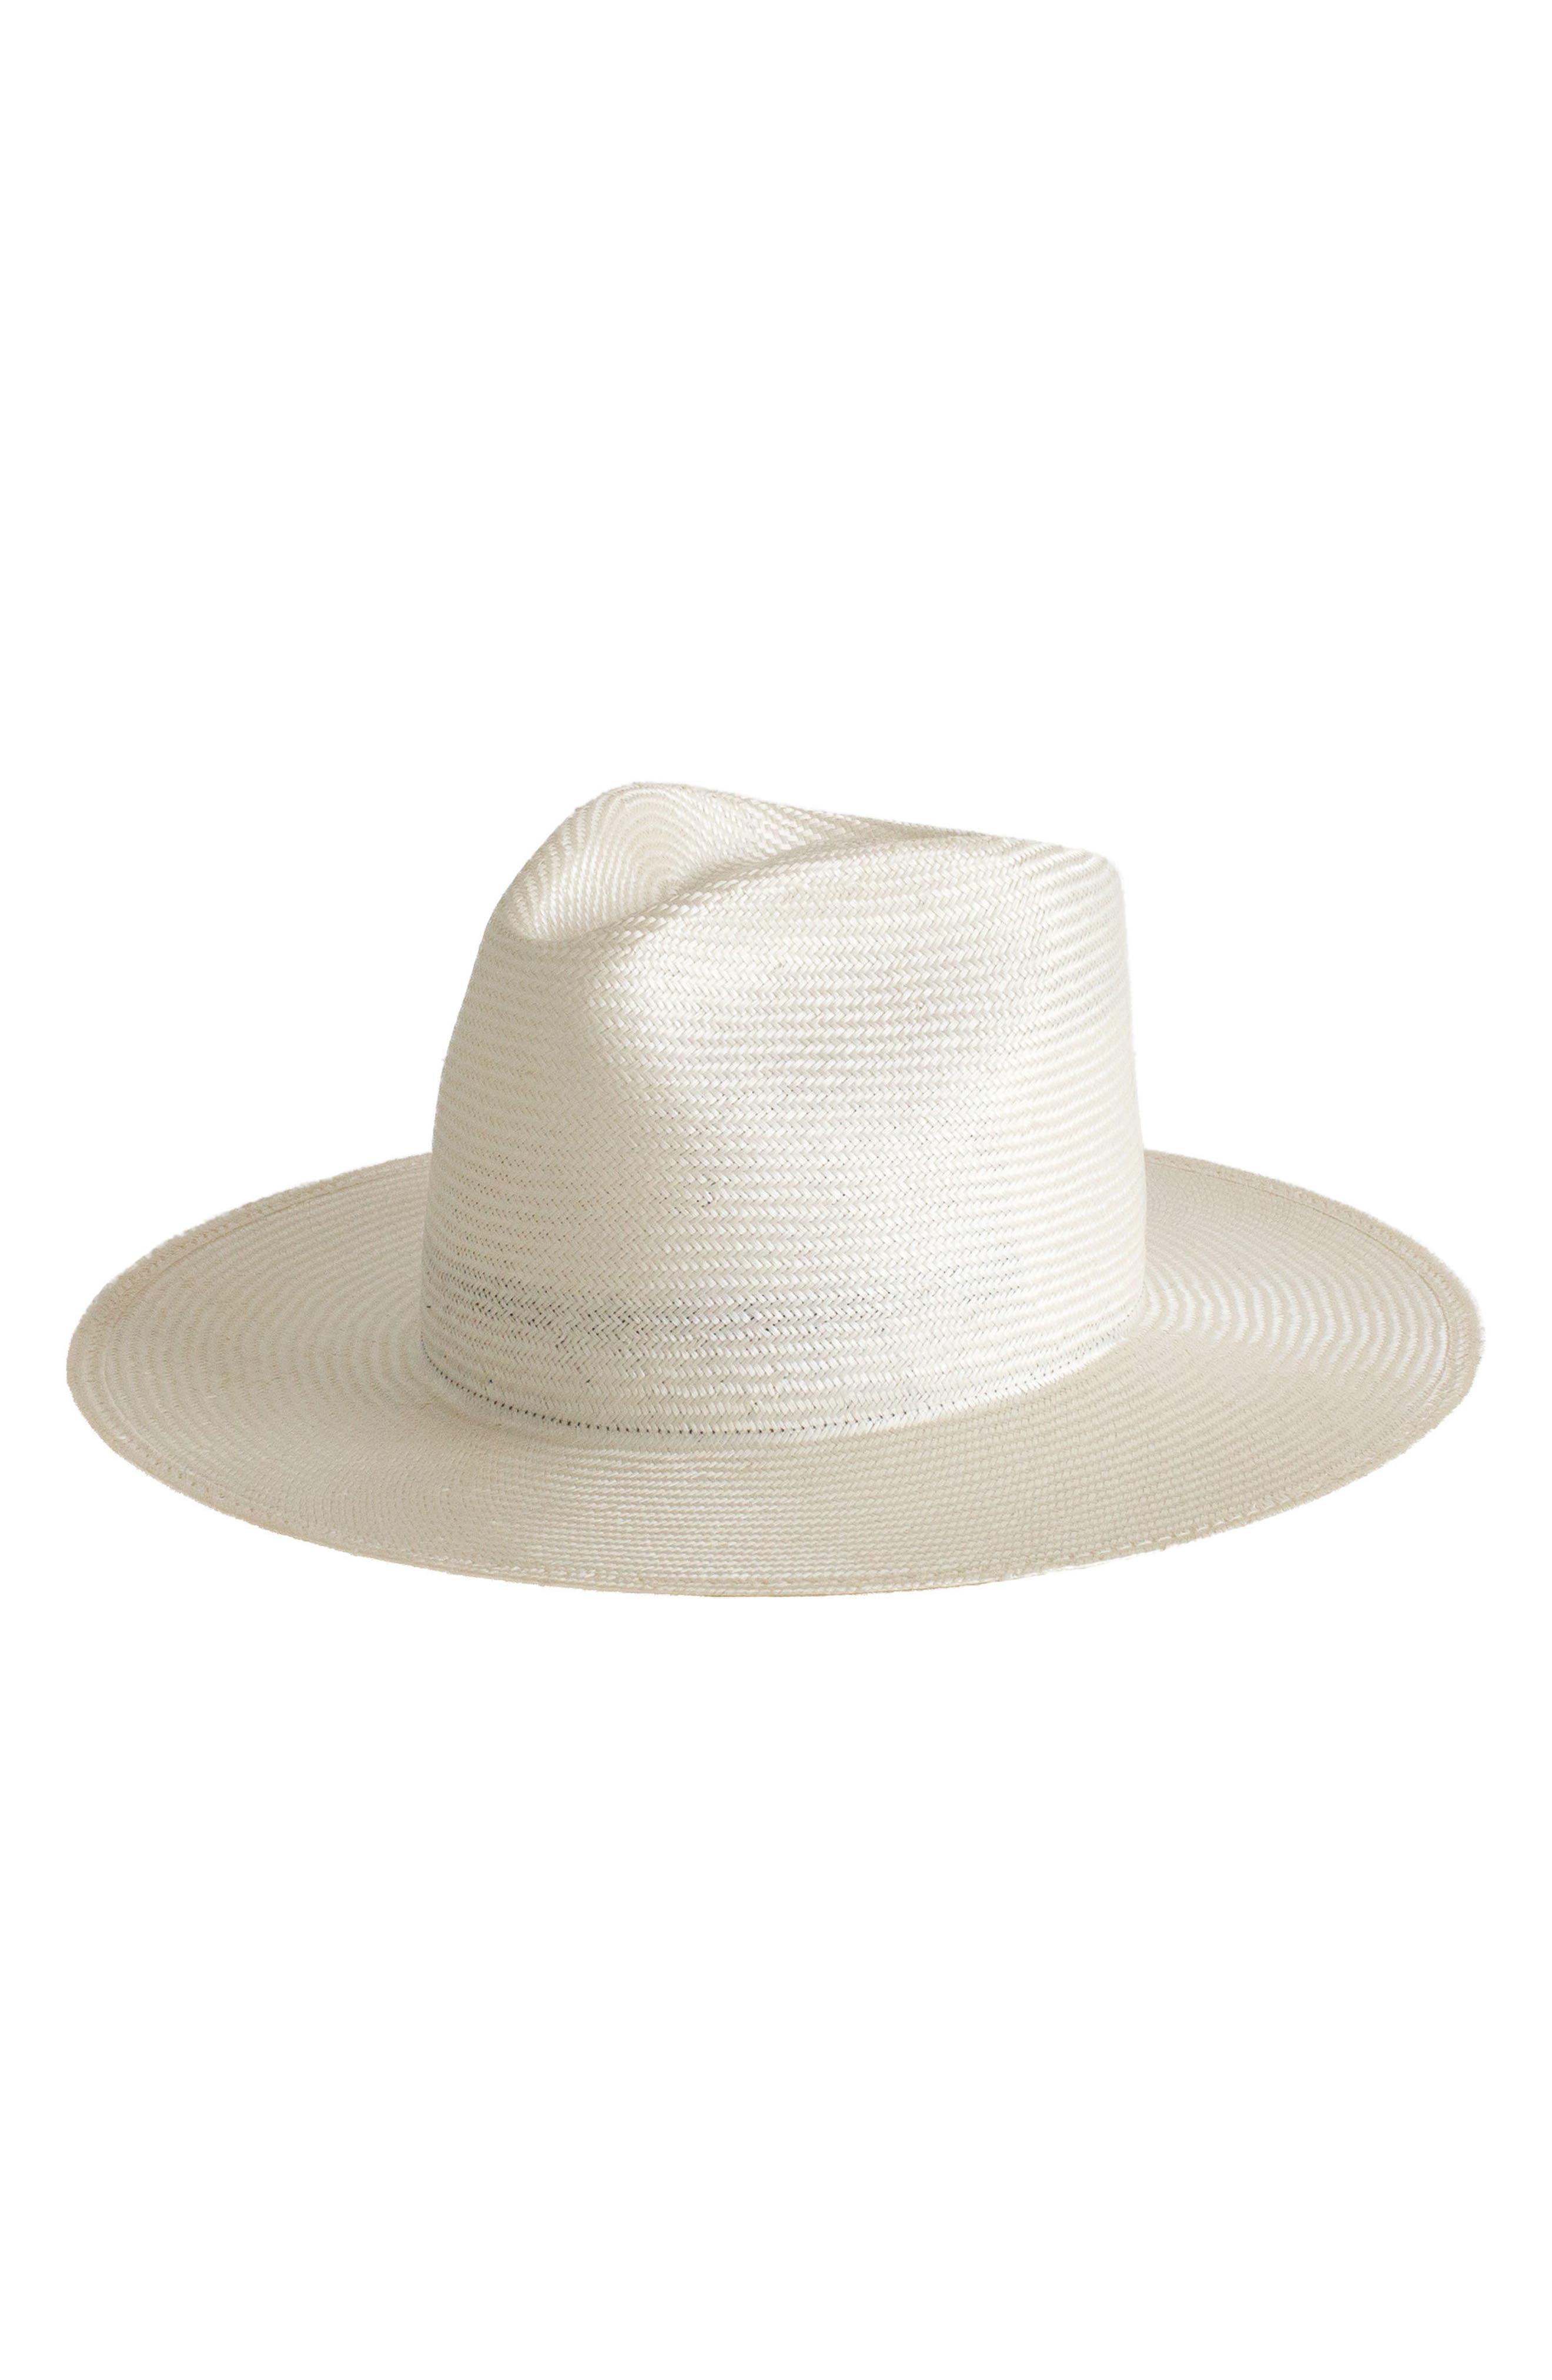 Alexander Straw Hat,                         Main,                         color, Natural